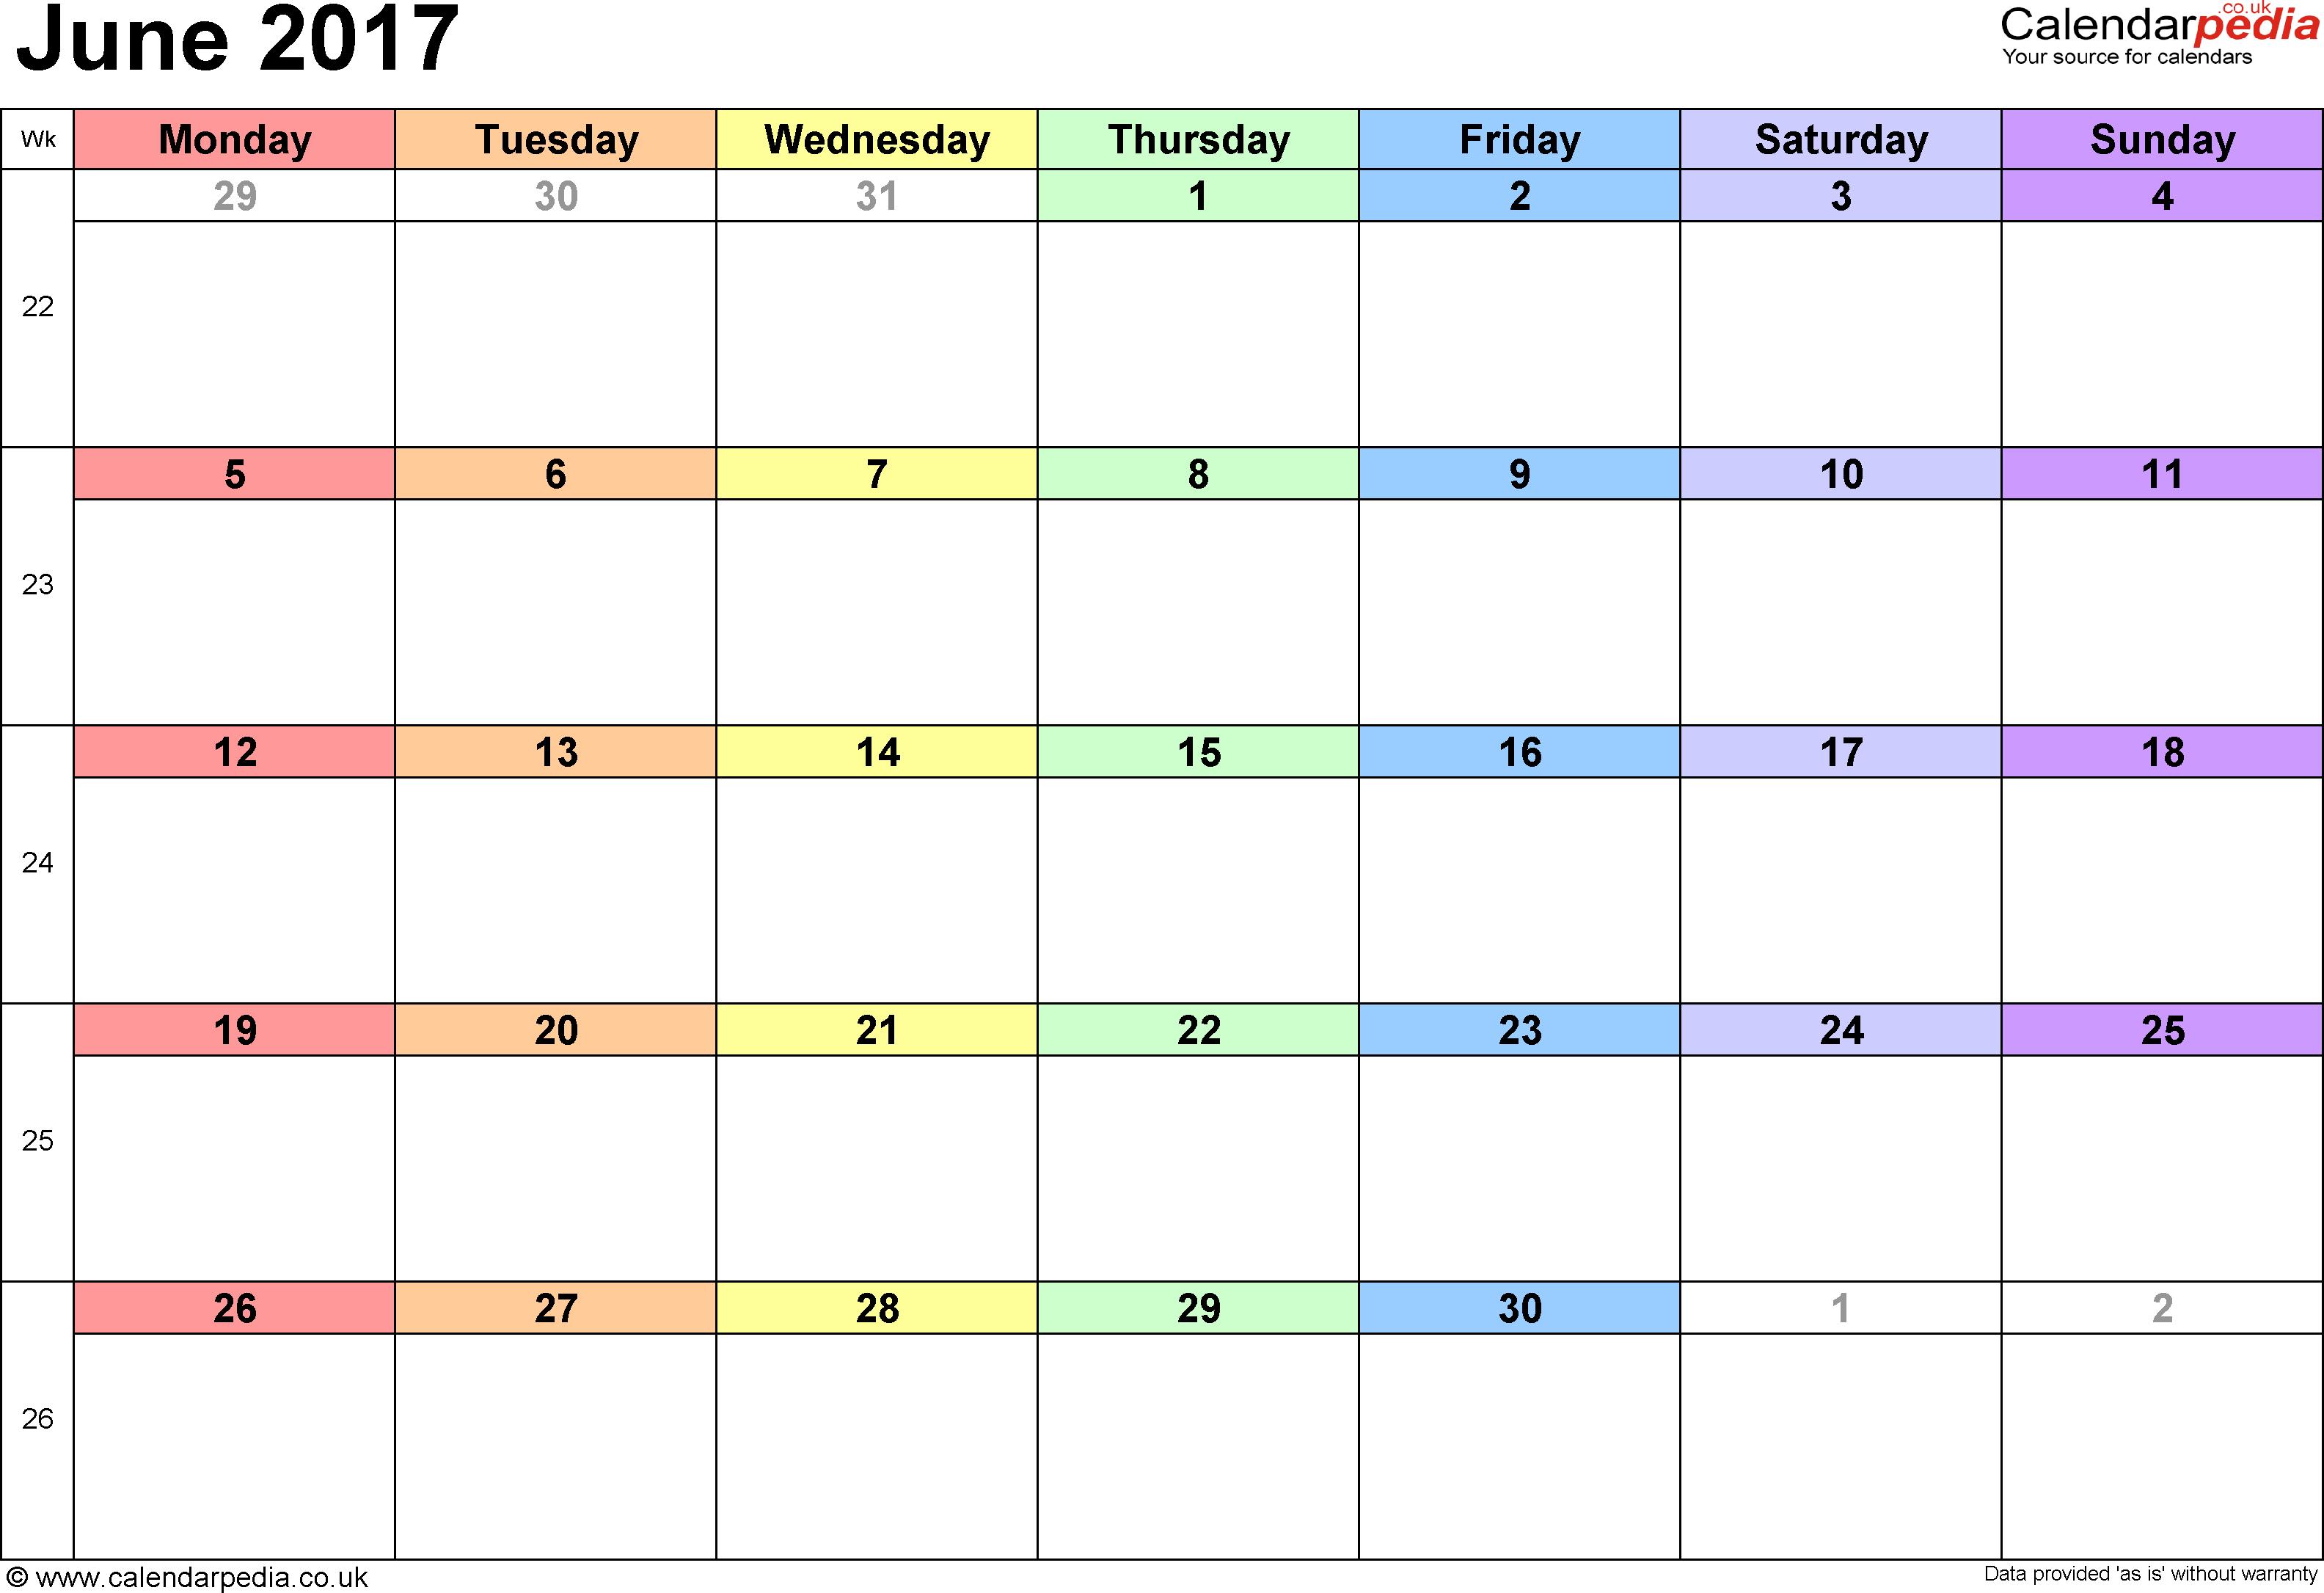 June Calendar 2017 UK